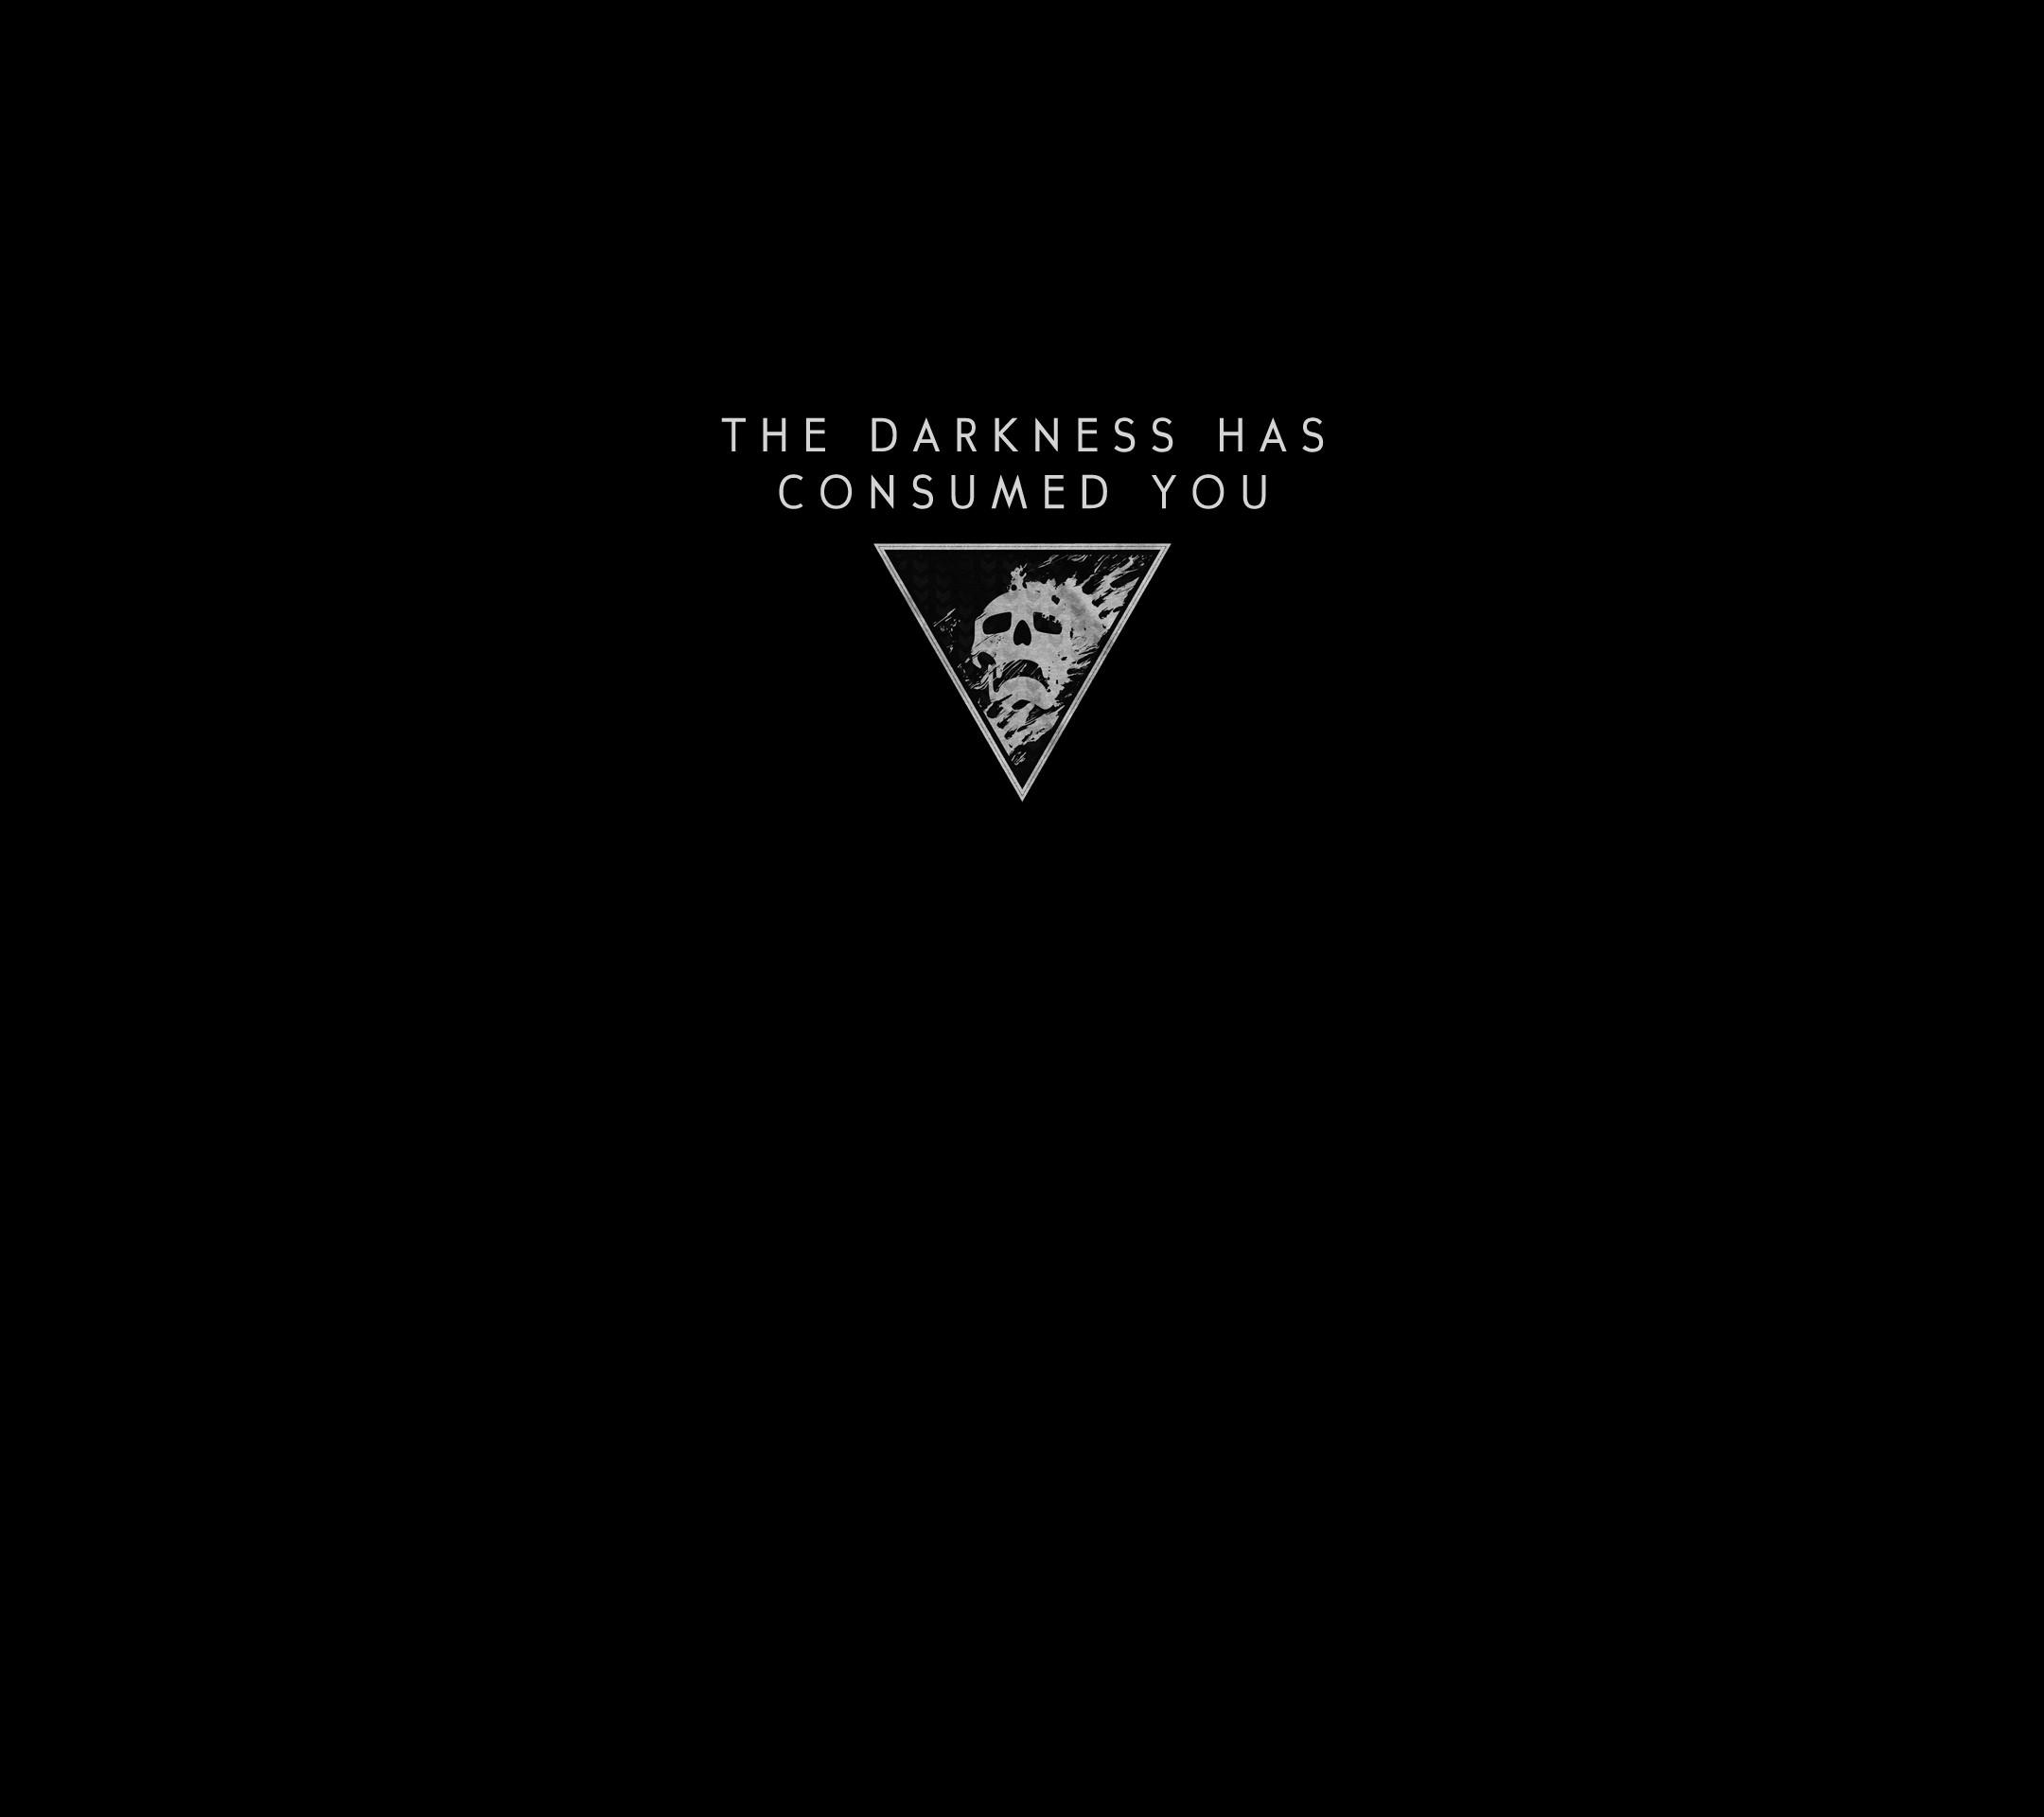 … Darkness Wallpaper